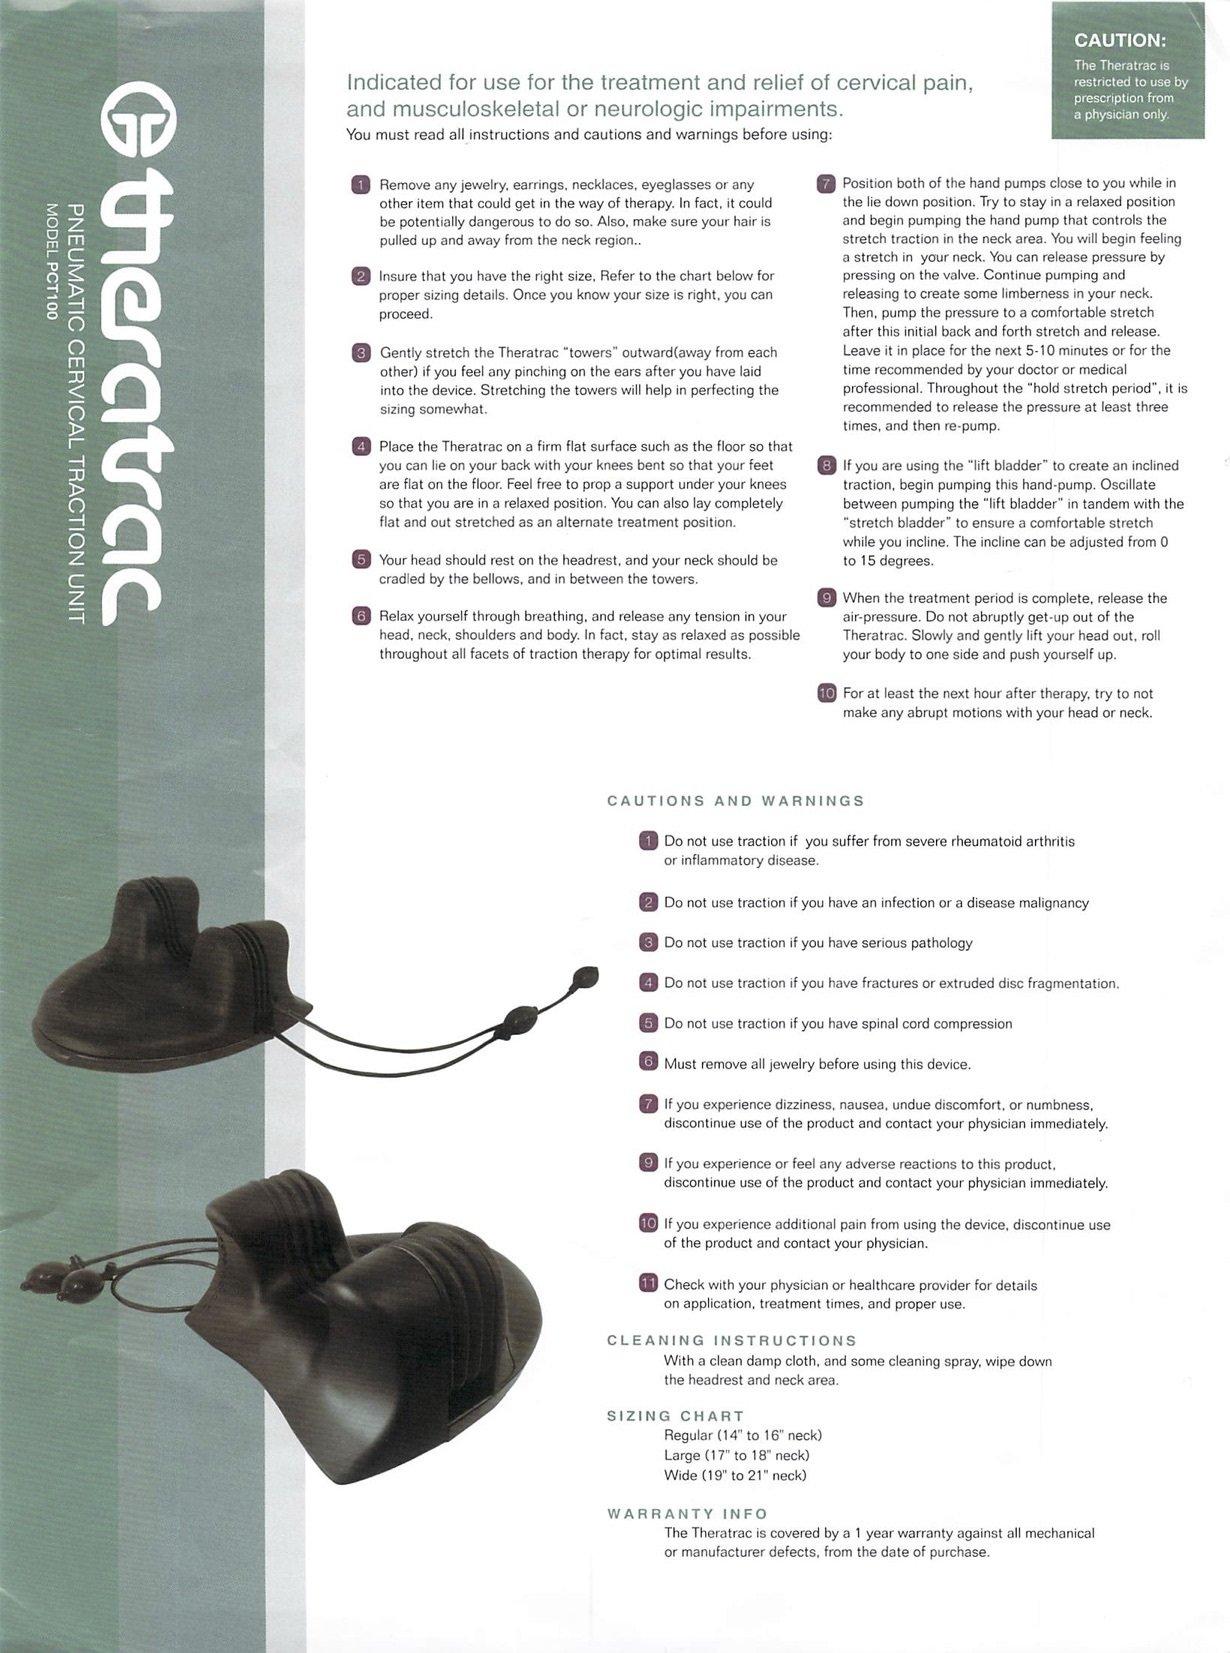 Pain Management Technology PMT-PCT100-L Theratrac Cervical Traction Device - Size 2 - Large - 17'' -18'' neck